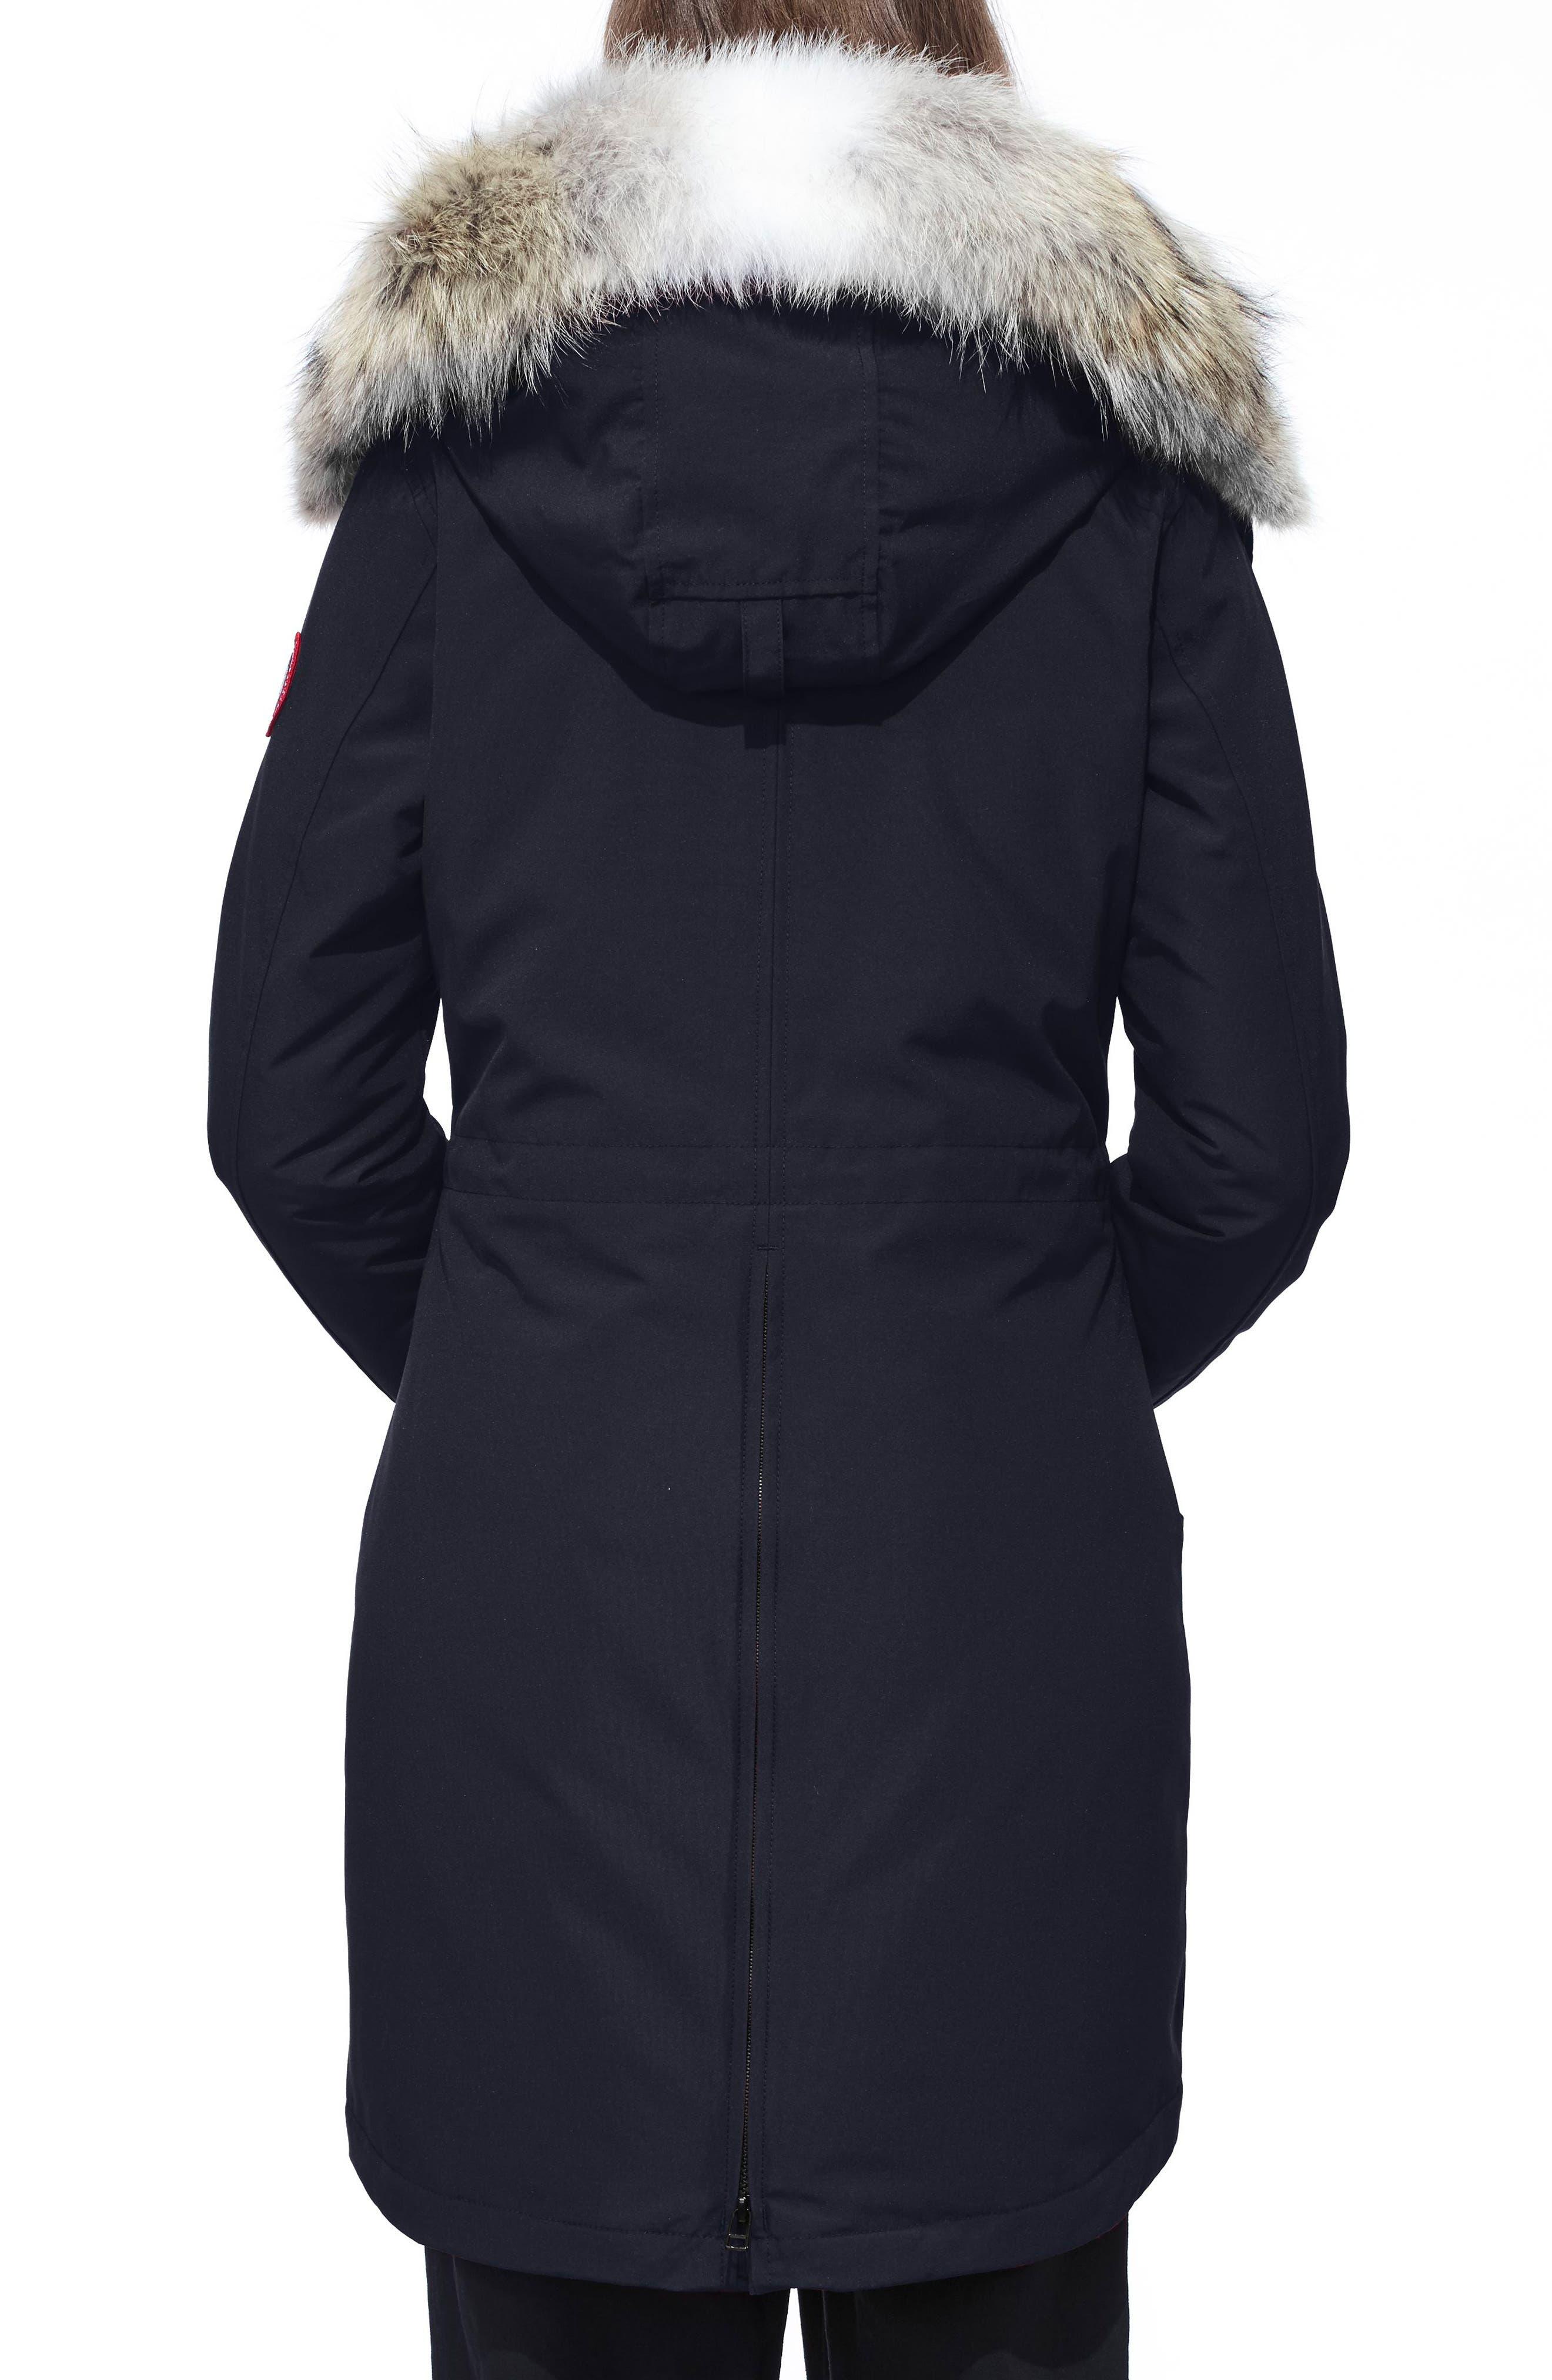 CANADA GOOSE, Rossclair Fusion Fit Genuine Coyote Fur Trim Down Parka, Alternate thumbnail 2, color, ADMIRAL BLUE